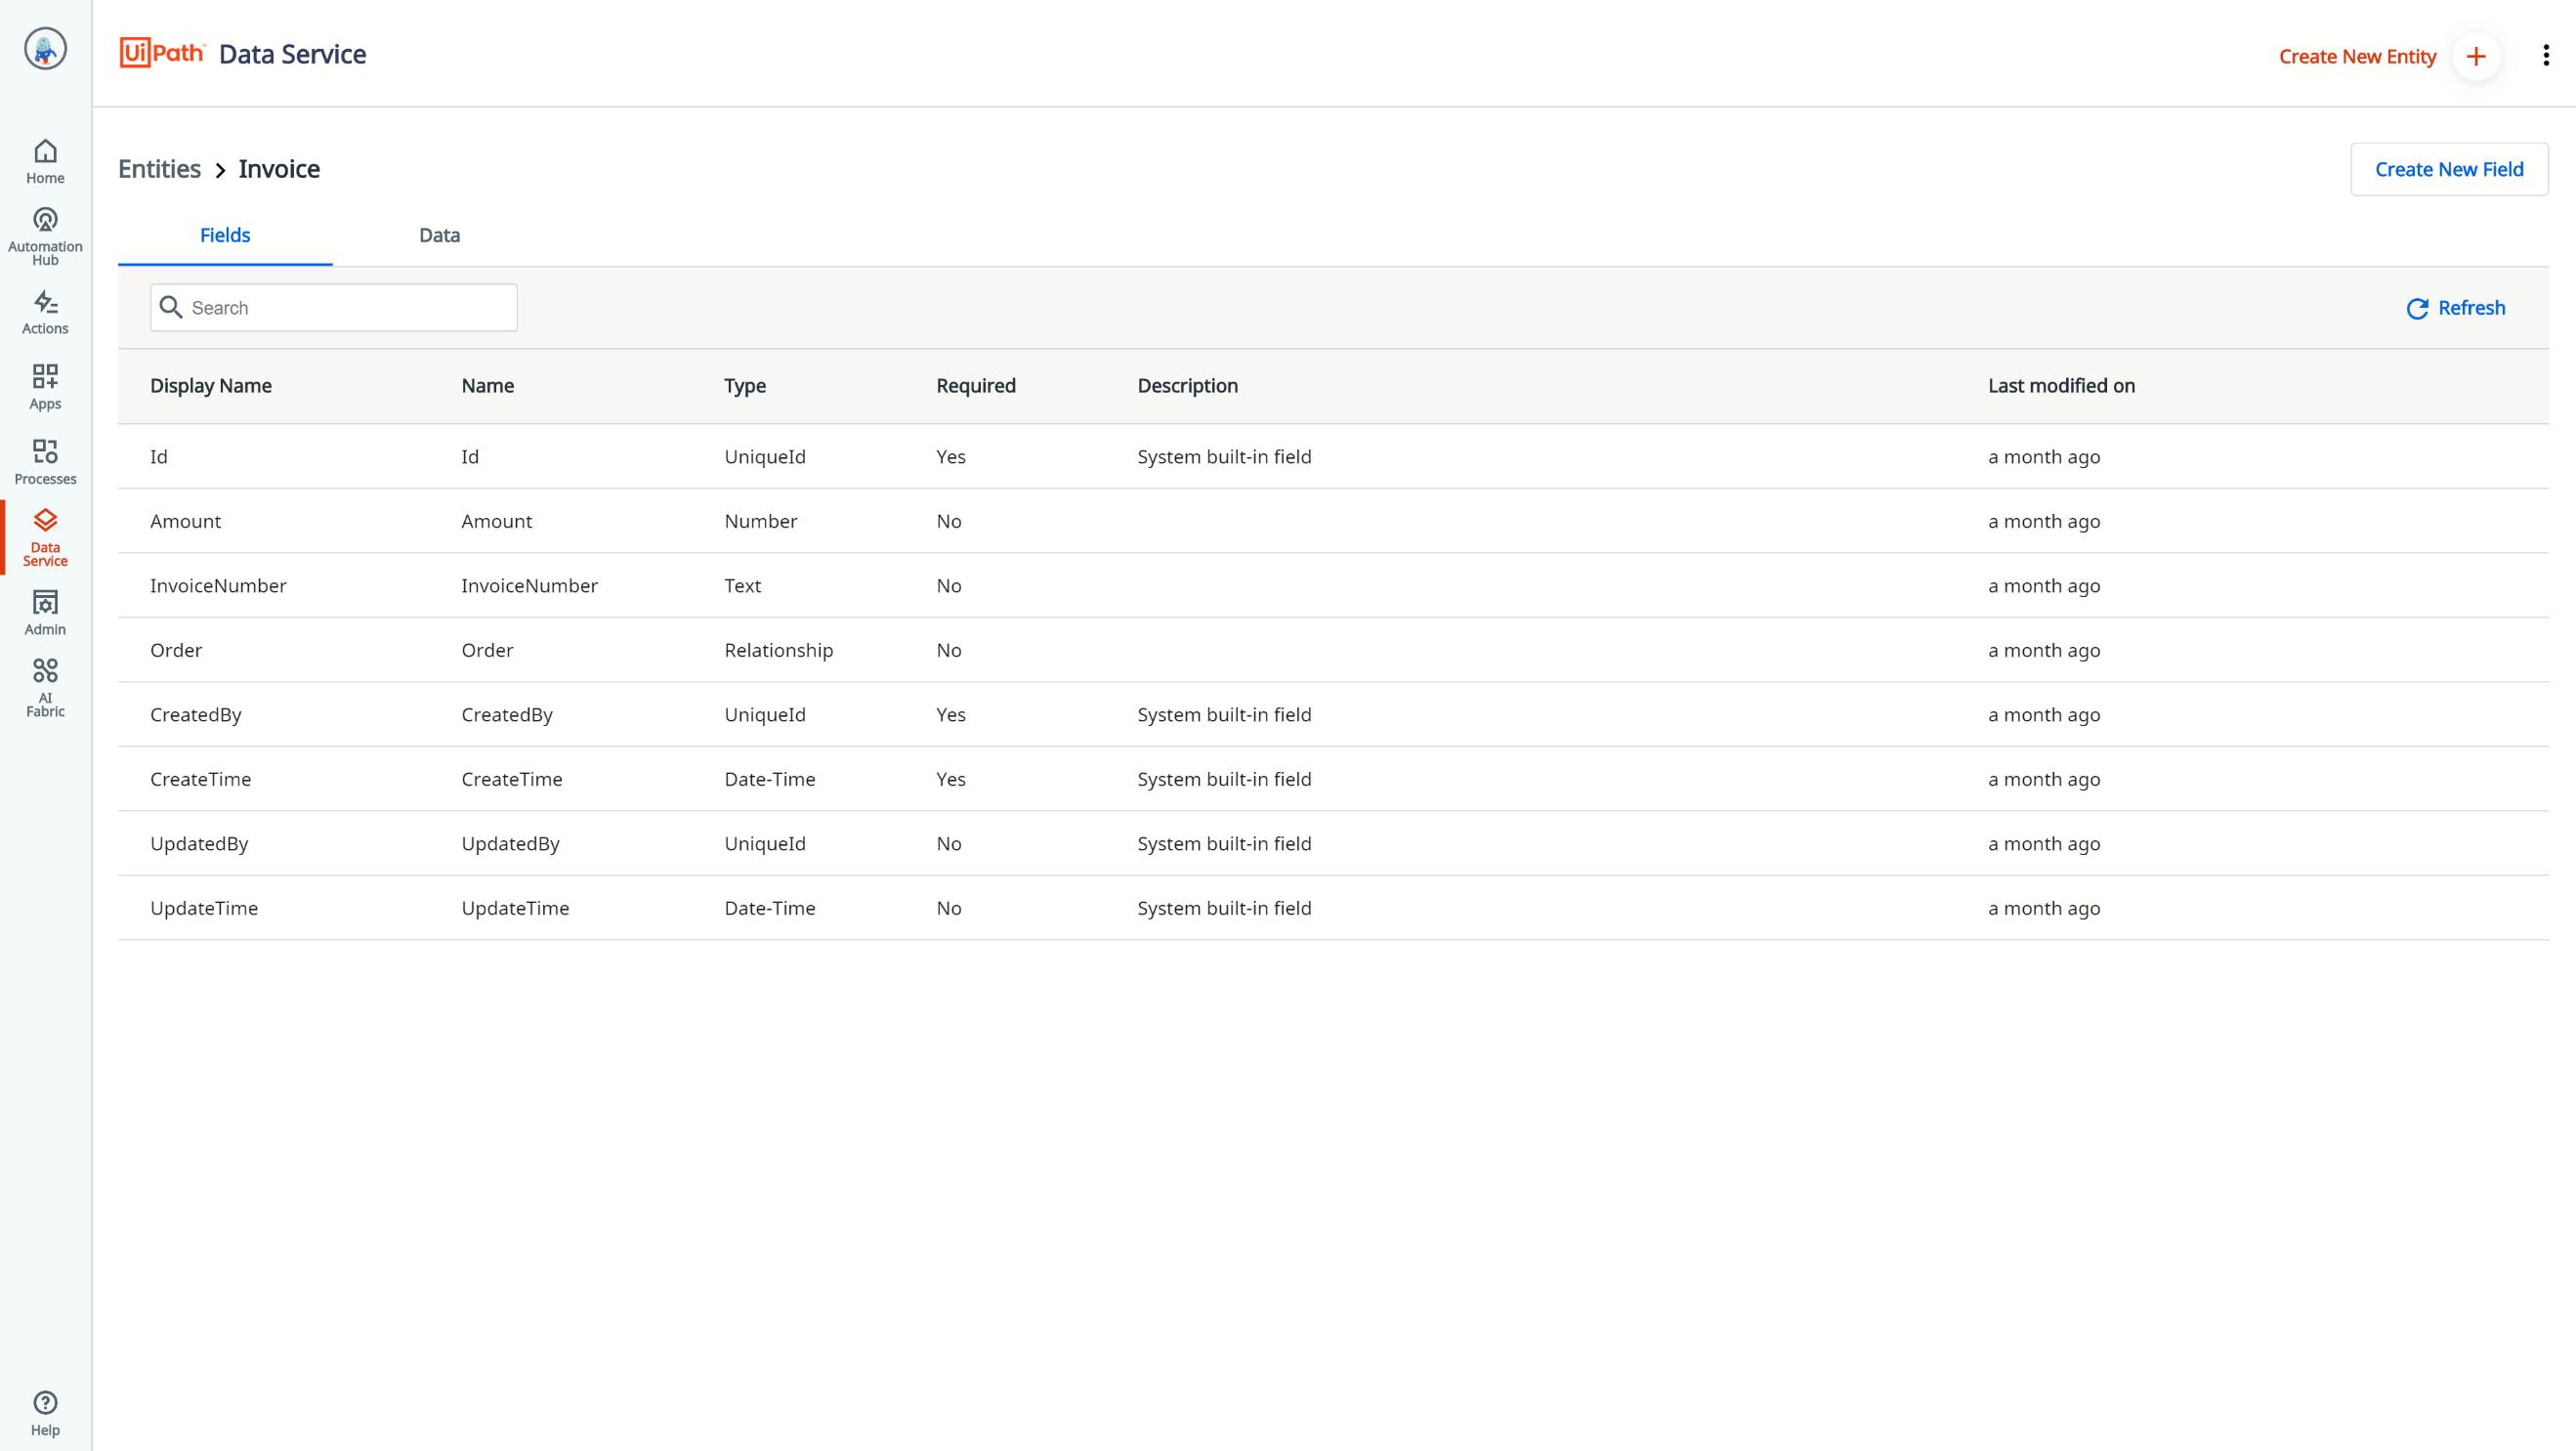 uipath data service